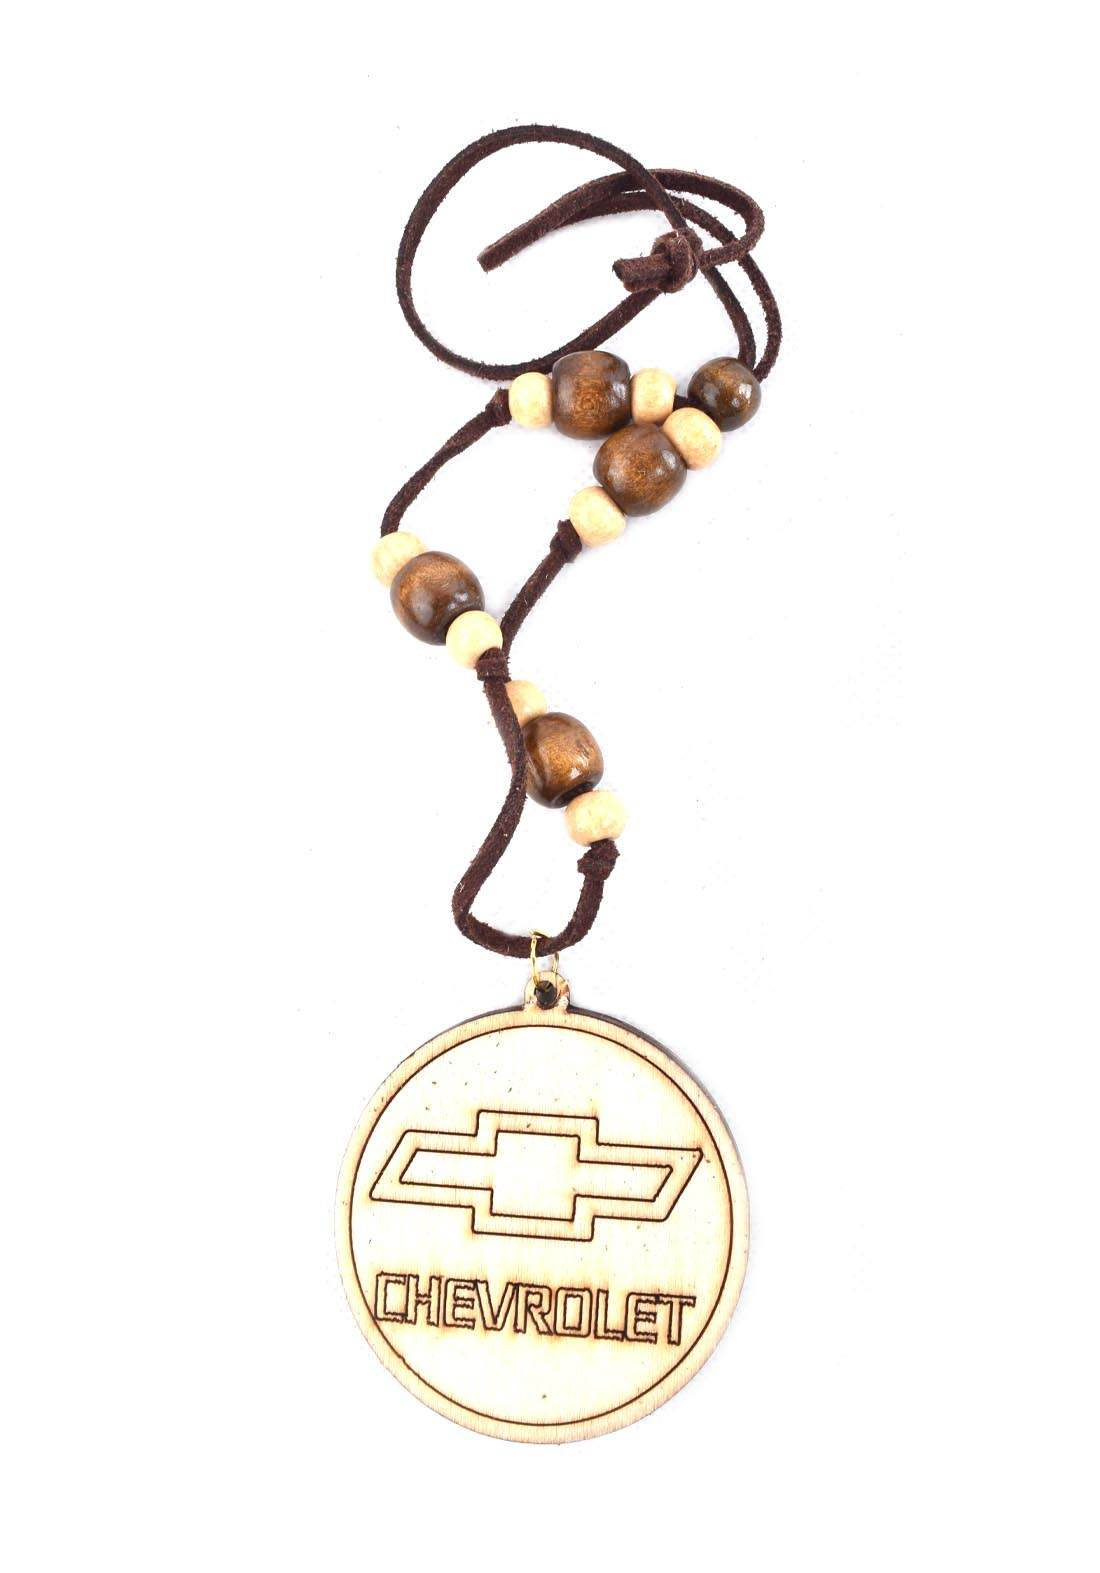 Car Medal - Chevrolet  تعليقة مرآة السيارة